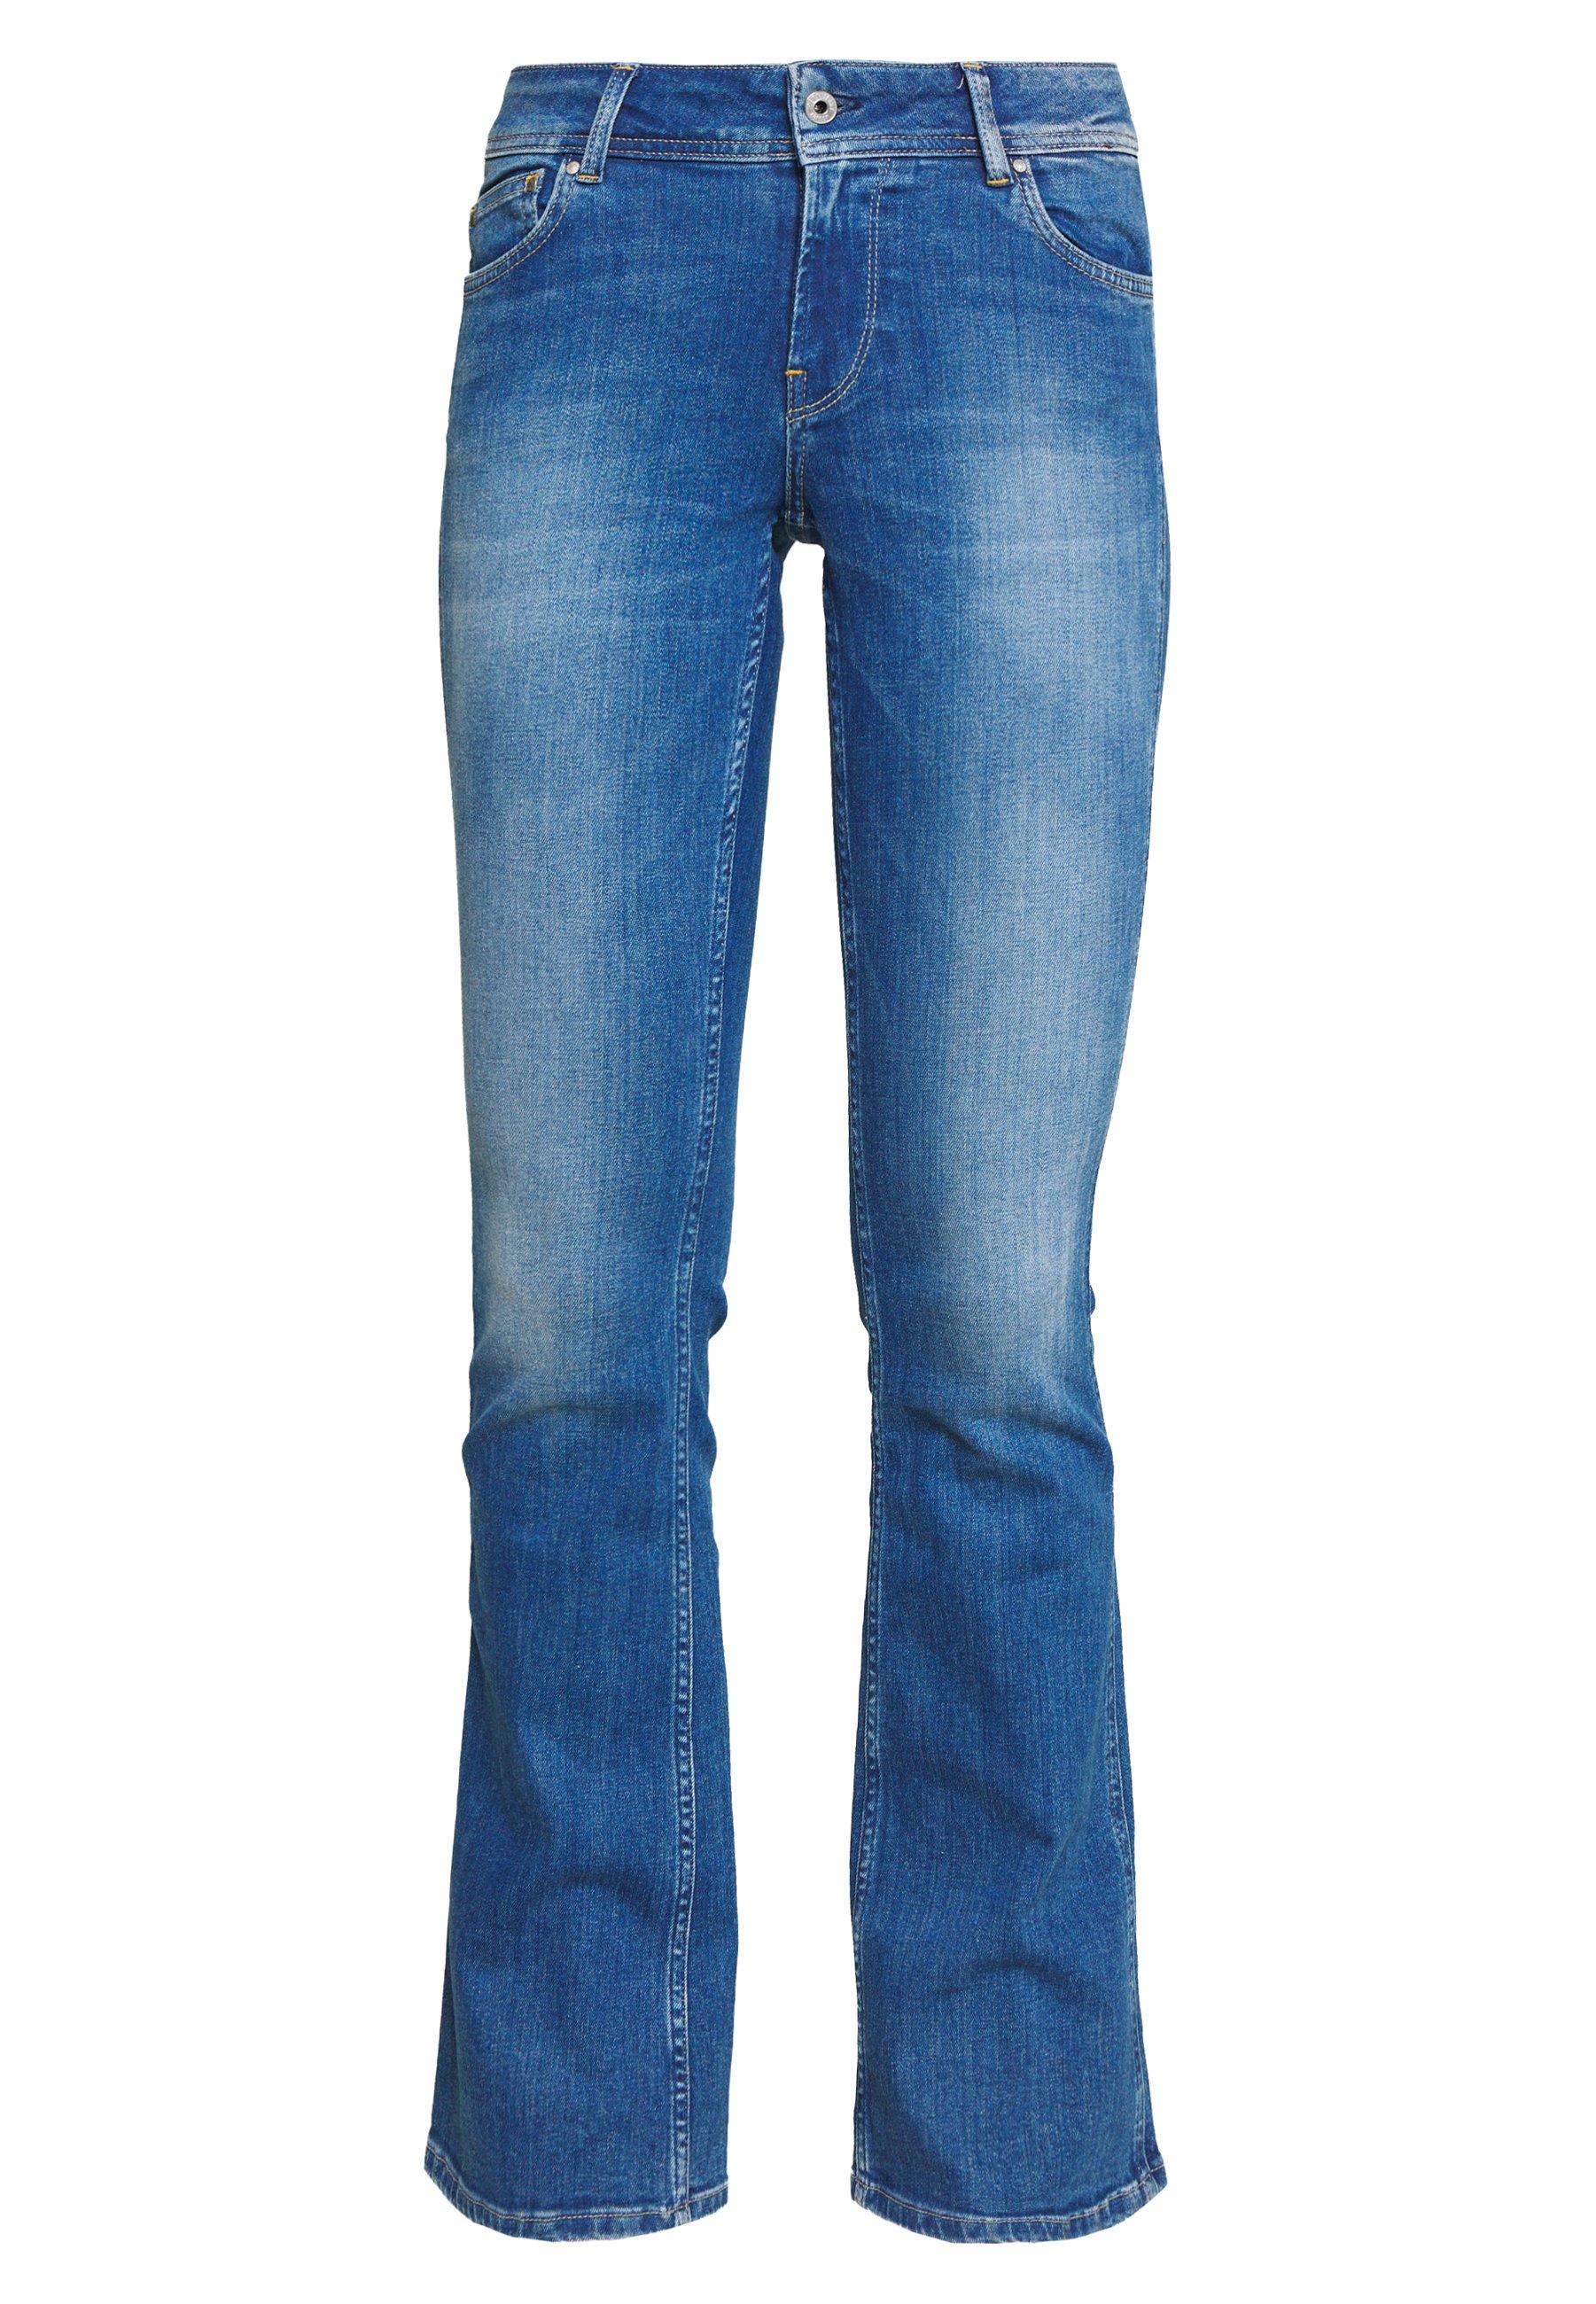 Pepe Jeans New Pimlico - Jean Flare Blue Denim